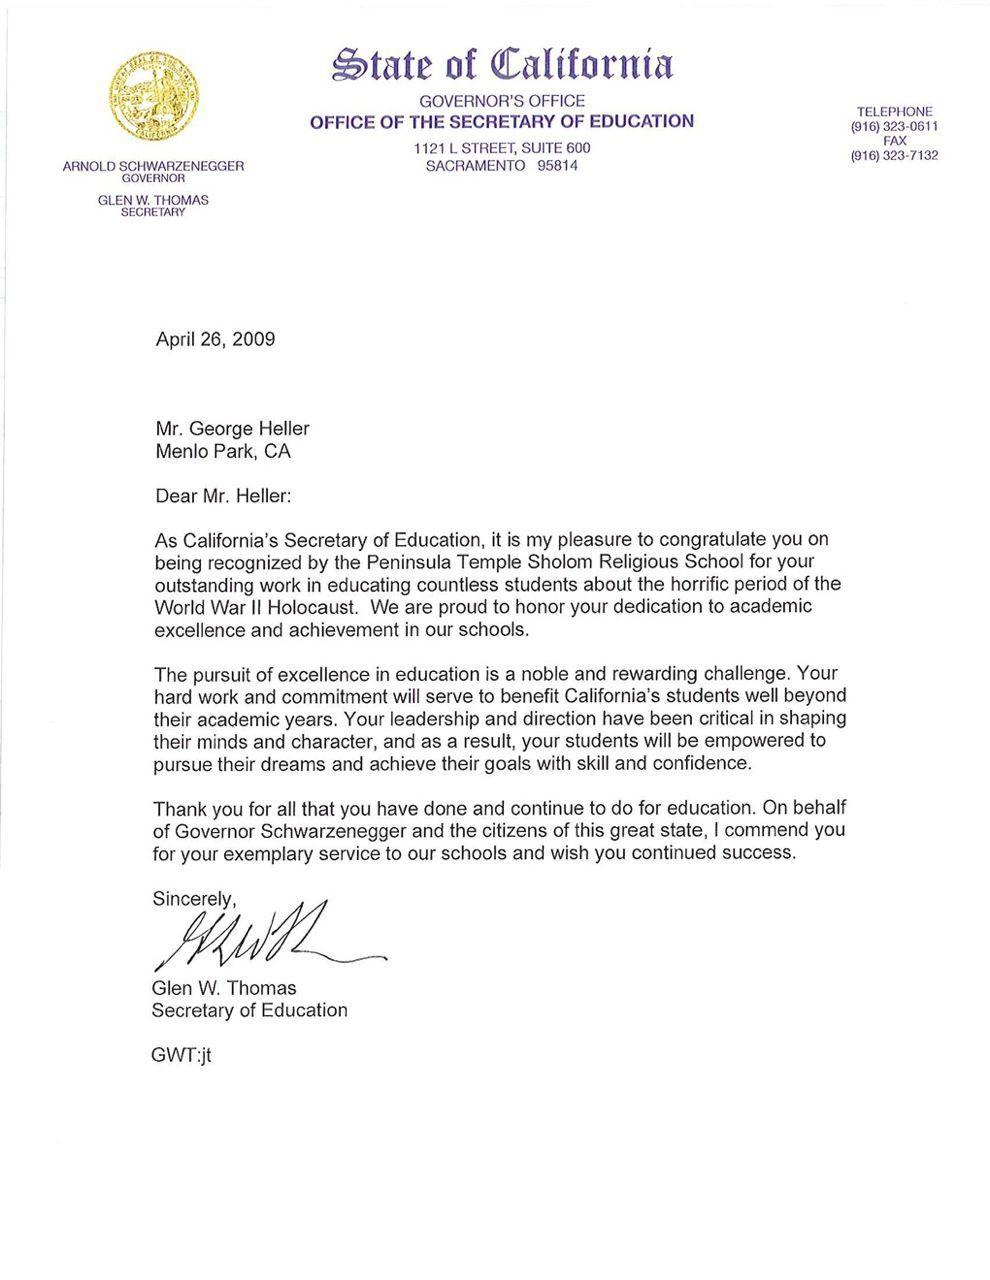 Sample School Event Invitation Letter Wedding Invitation